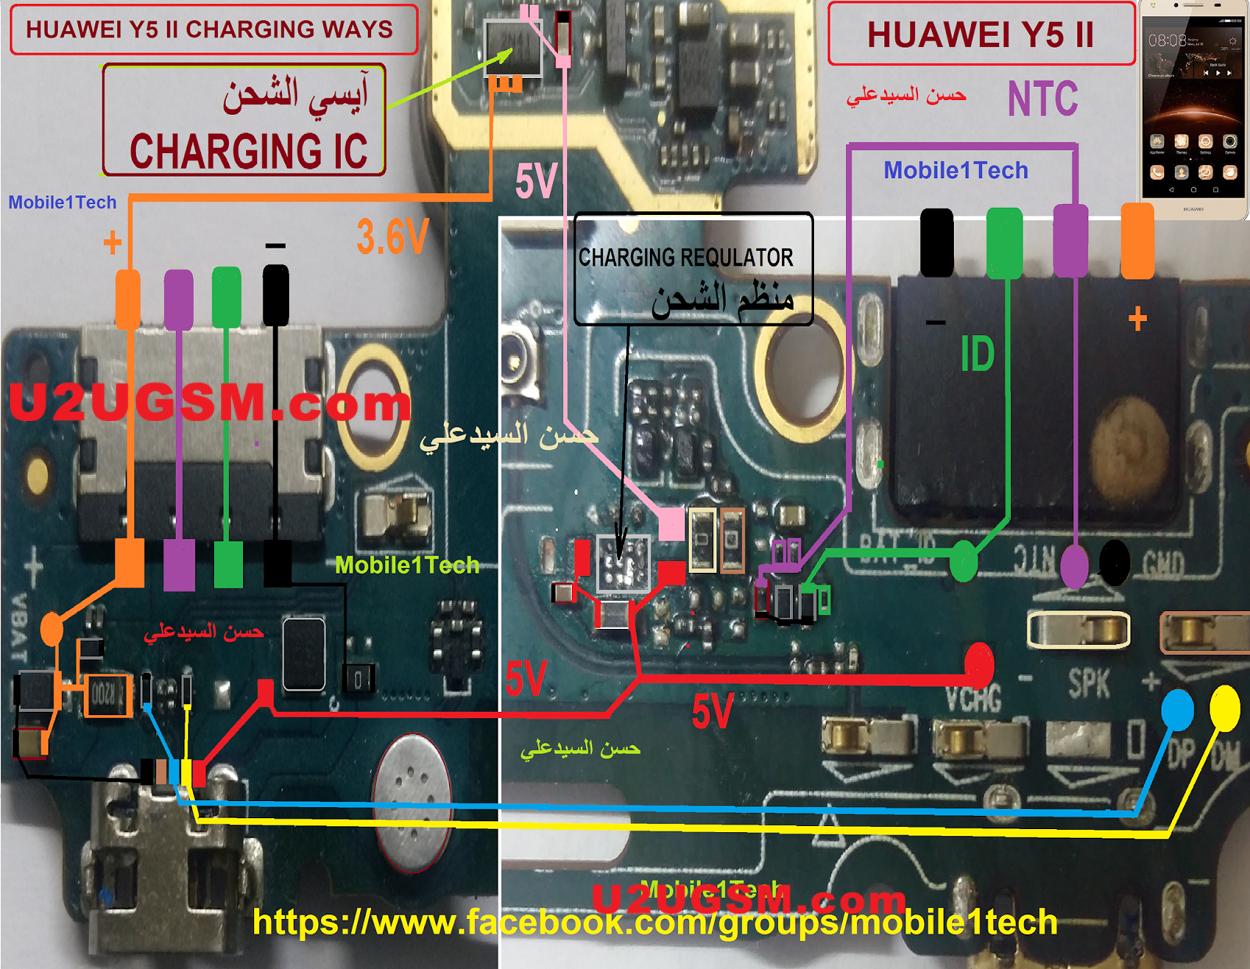 sony xperia j circuit diagram wiring diagram Sony Xperia C Circuit Diagram xperia z circuit diagram wiring diagrams